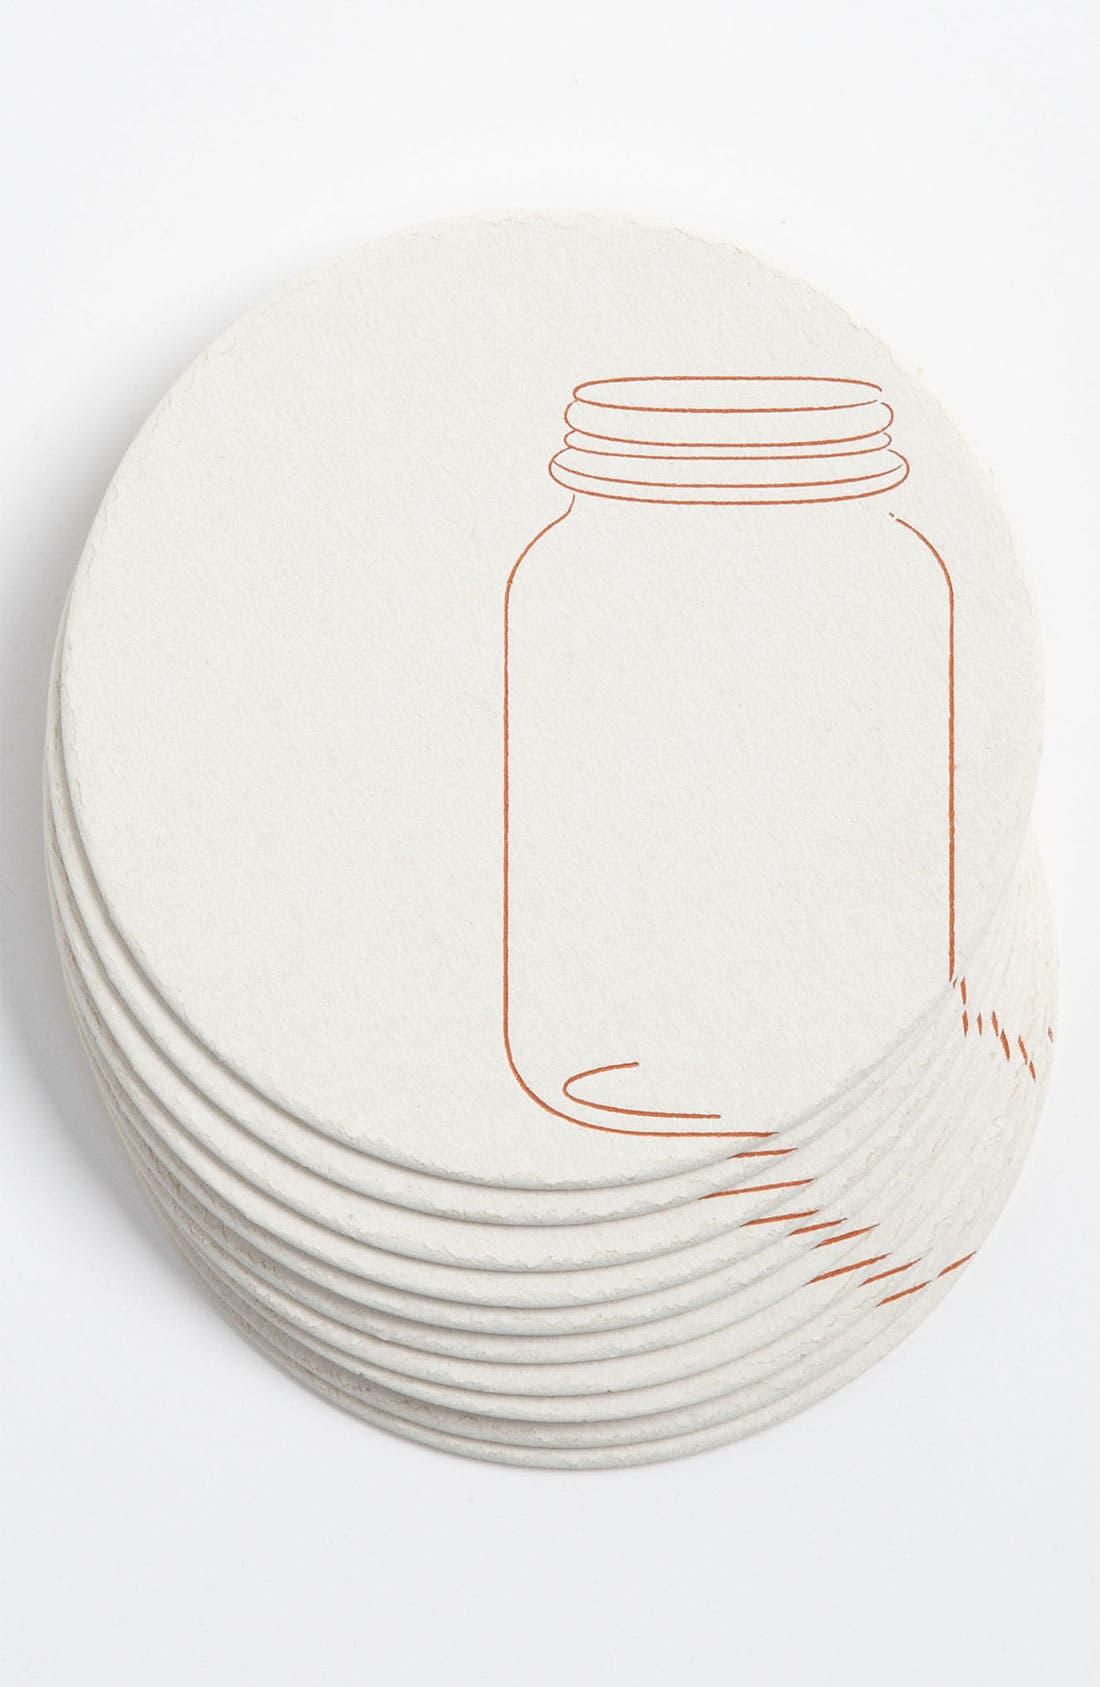 Alternate Image 1 Selected - 'Mason Jars' Letterpress Coasters (Set of 10)